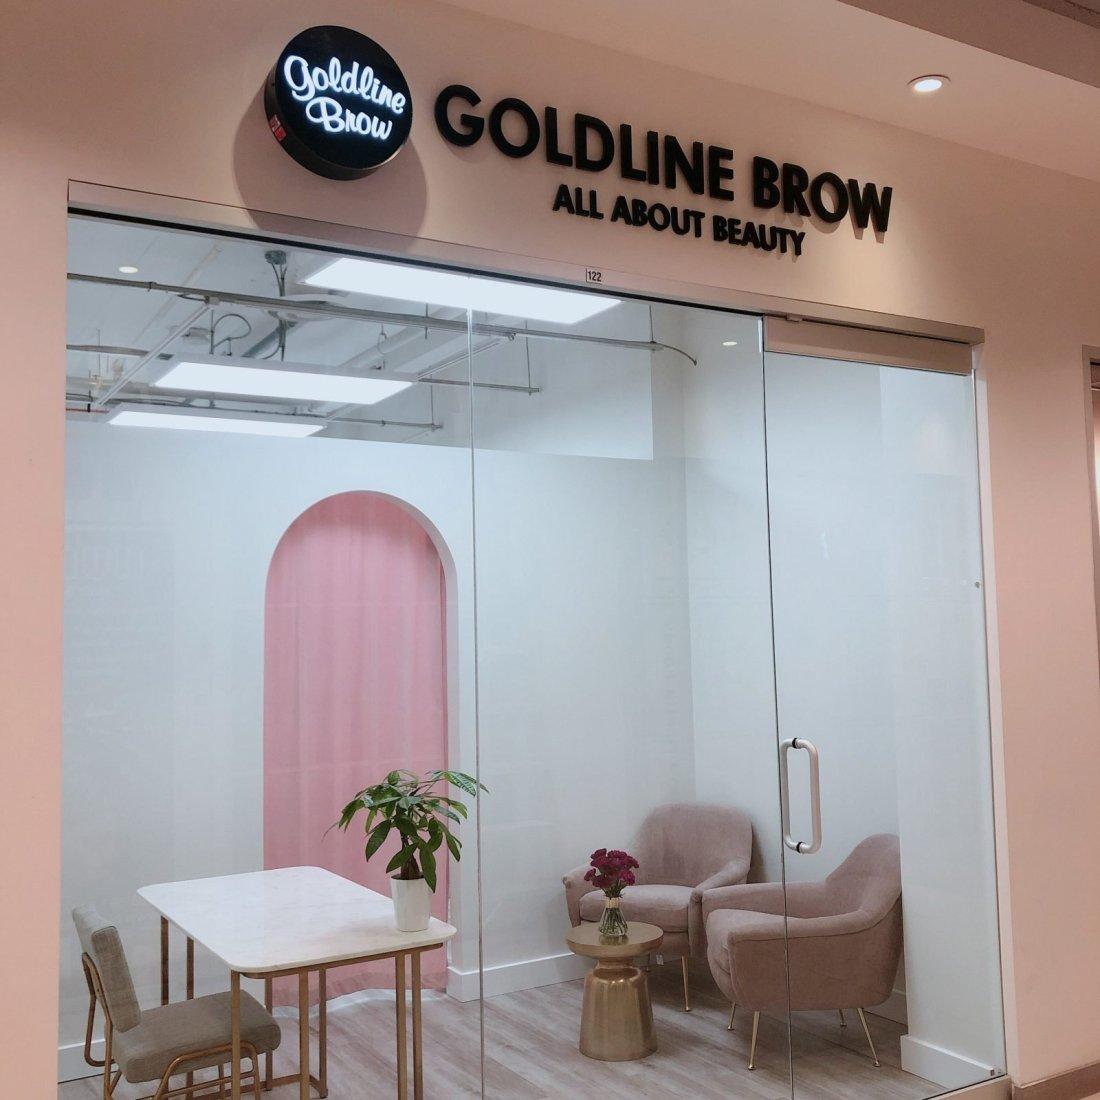 Goldline Brow